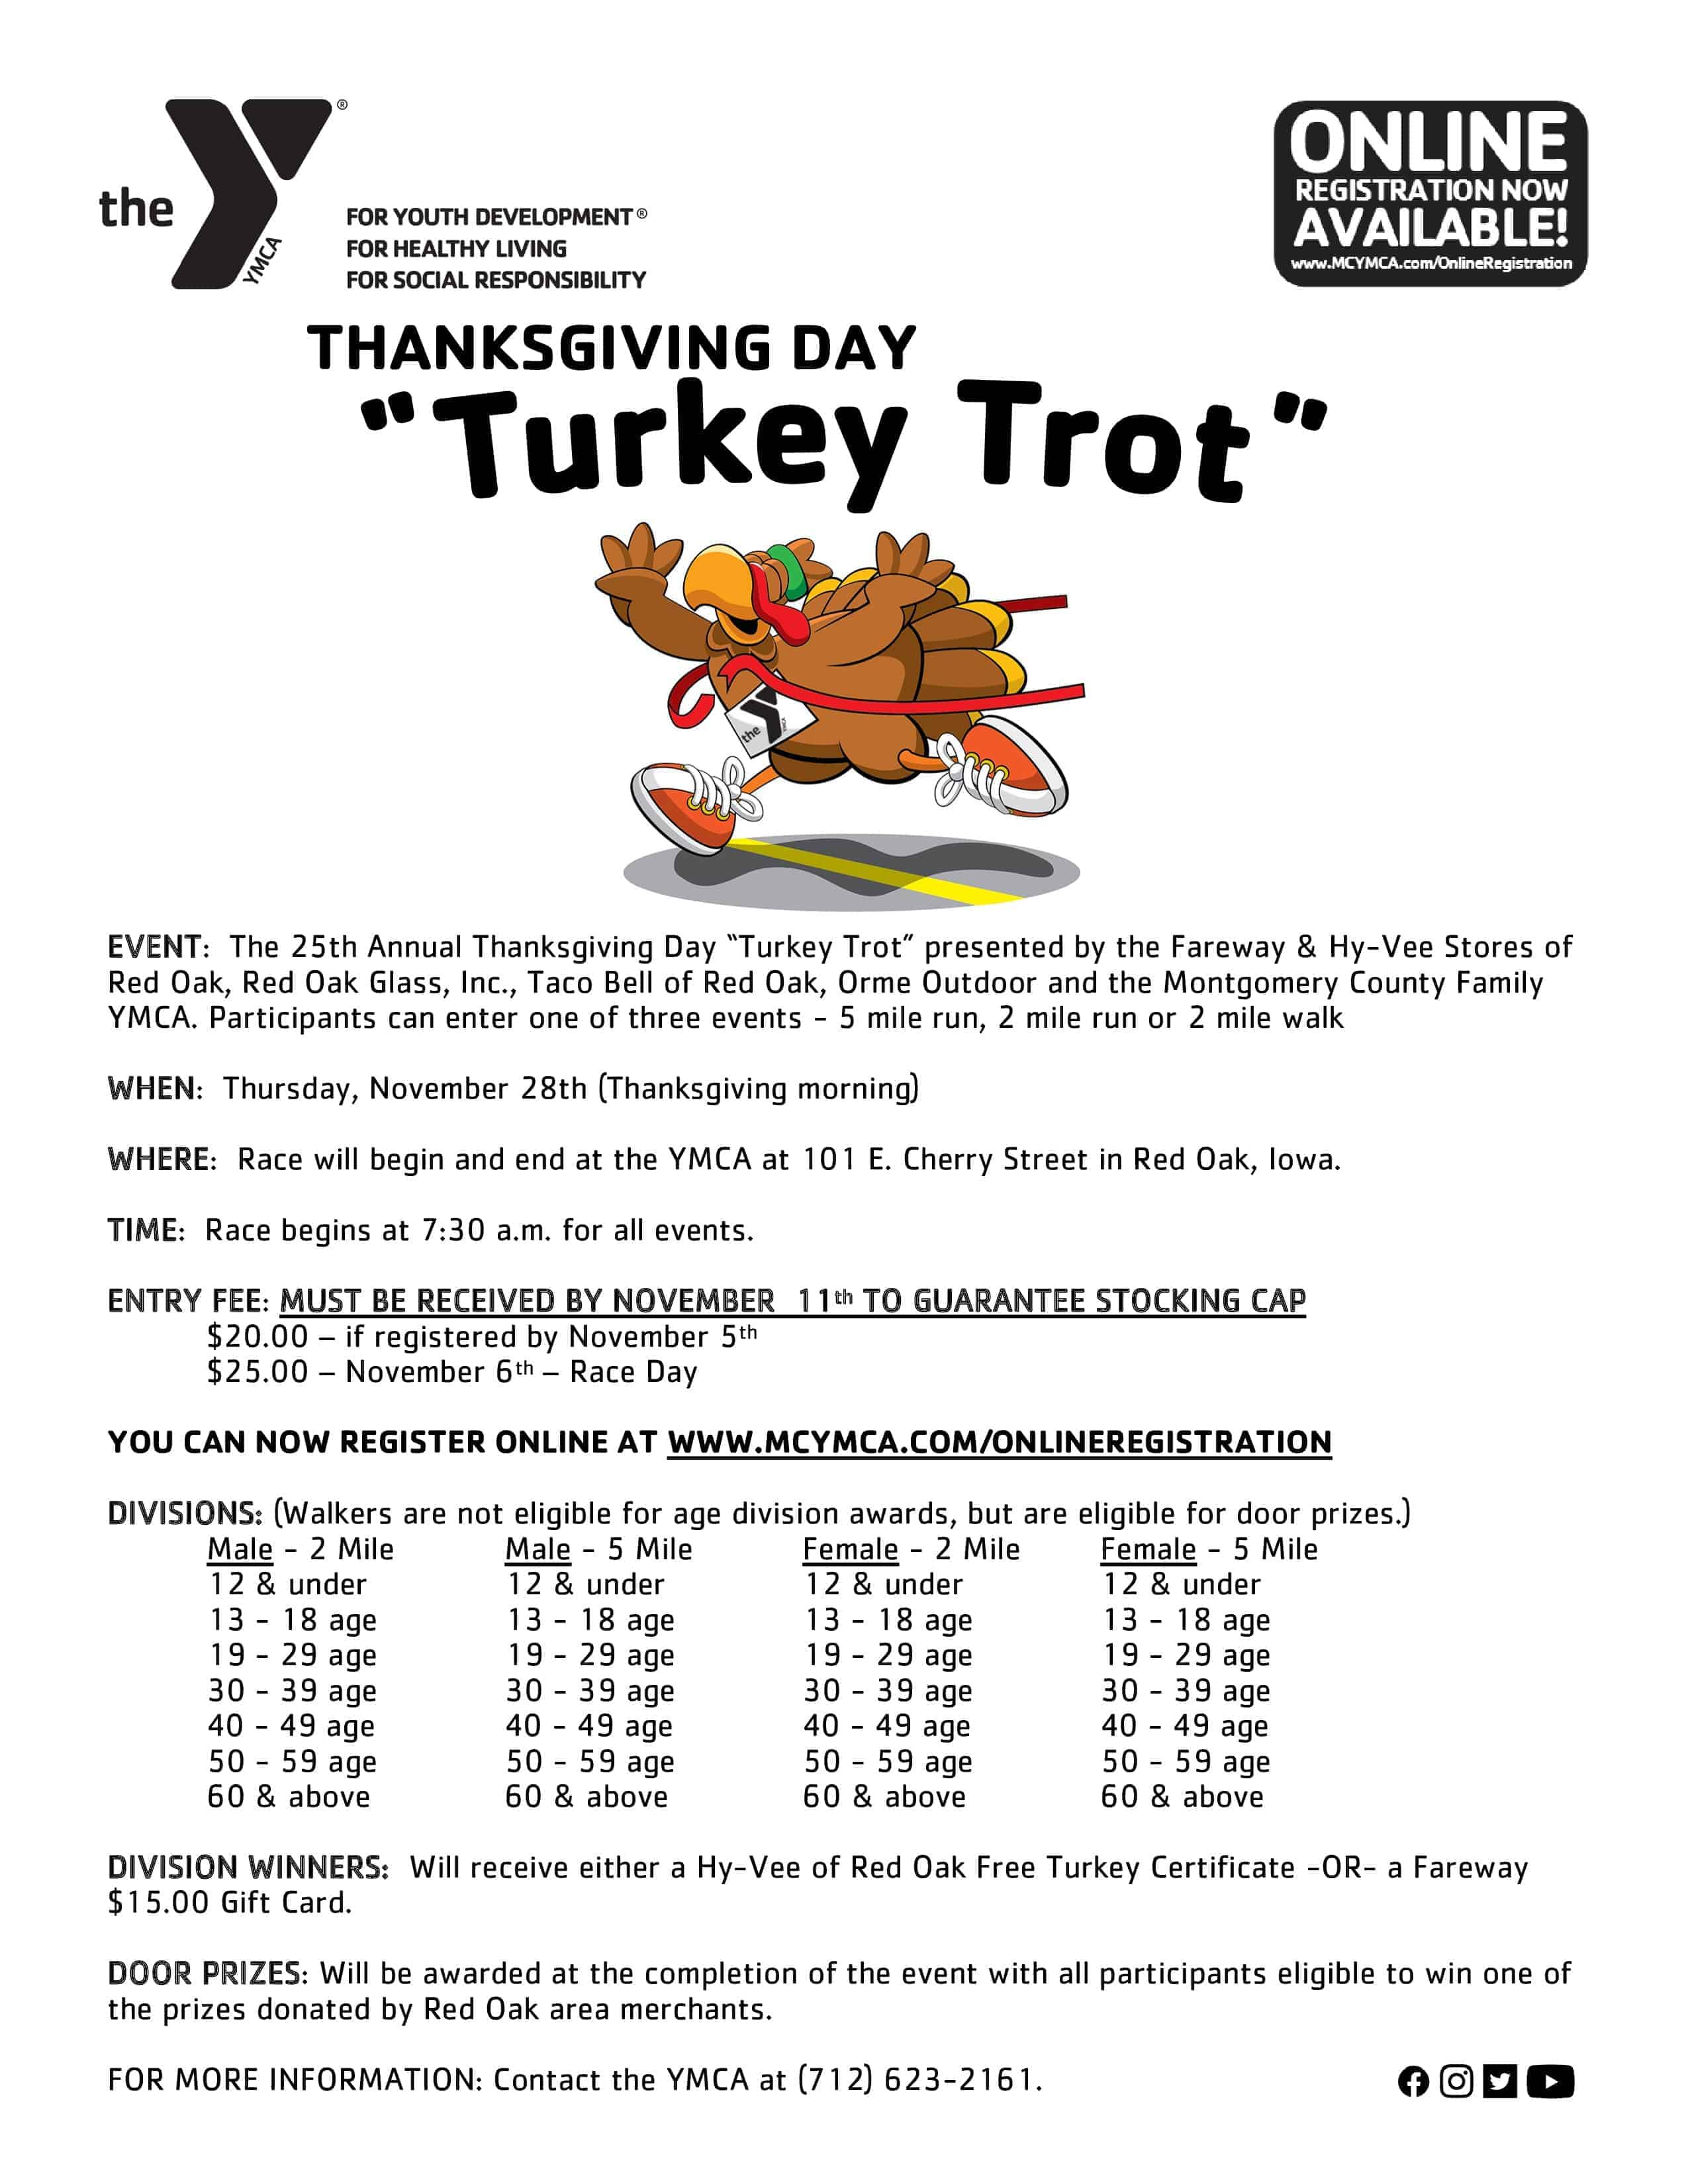 Thanksgiving Day Turkey Trot